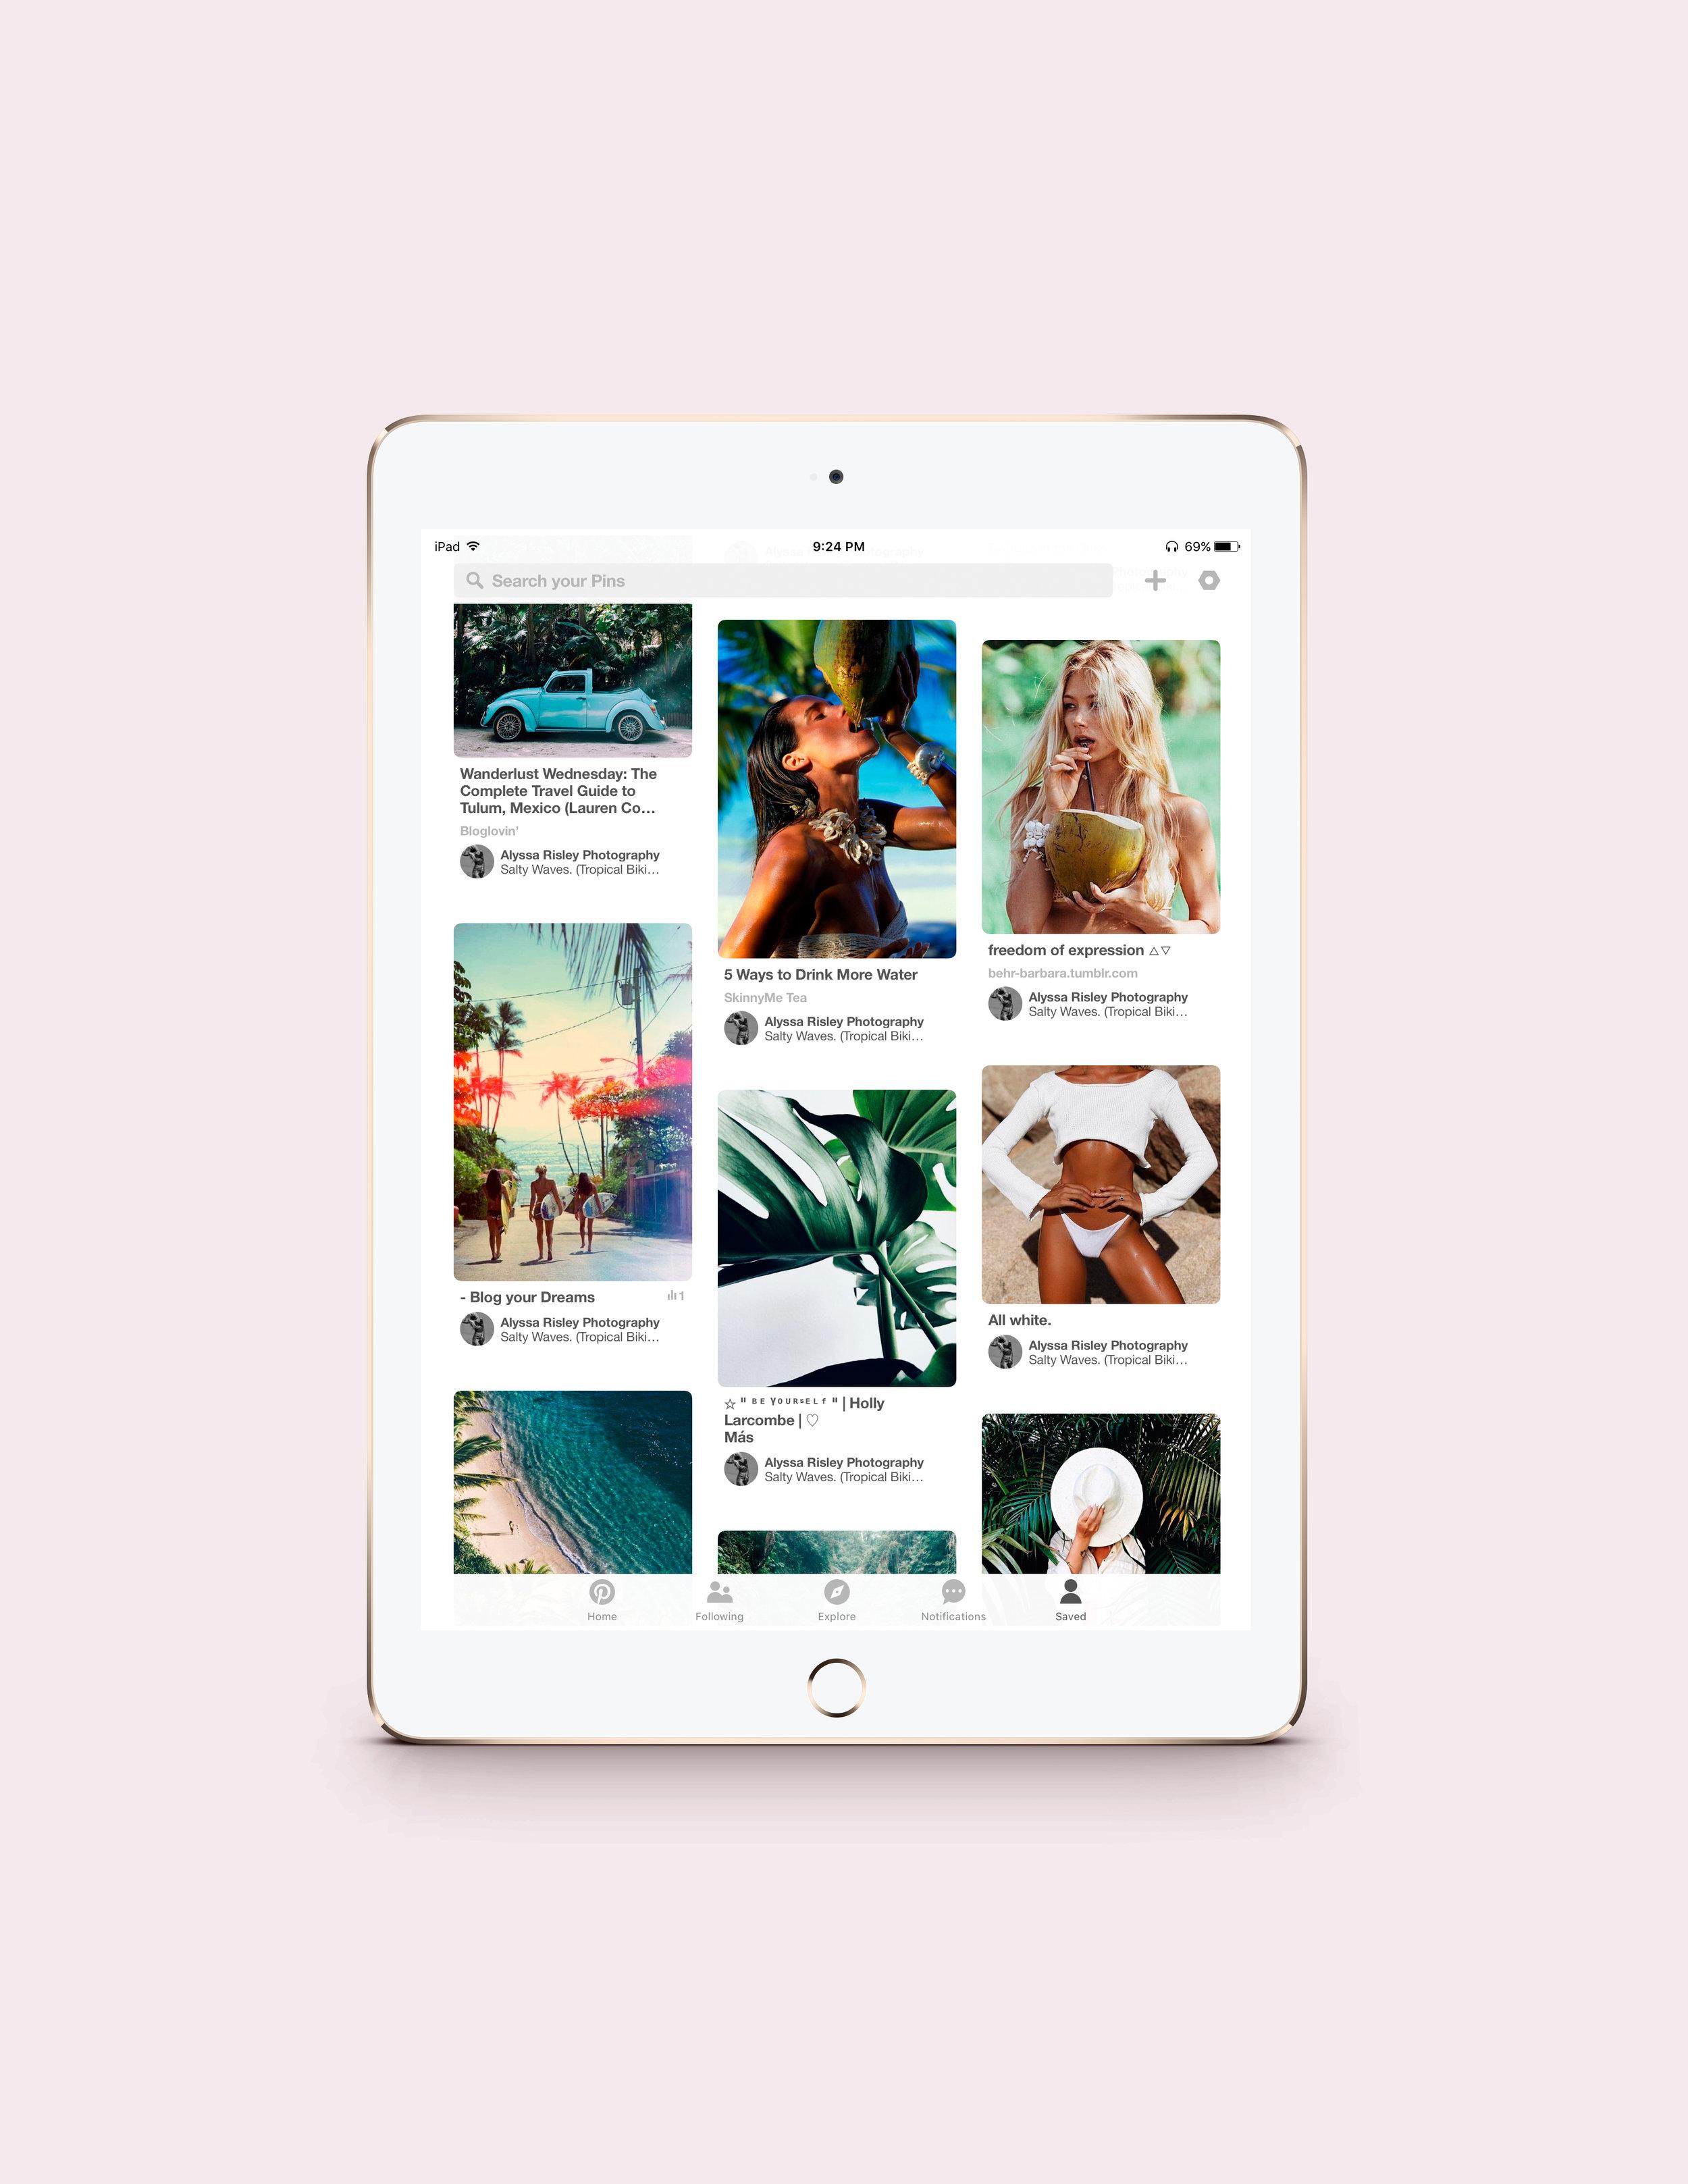 Instagram Content Blue Pinterest 33.jpg